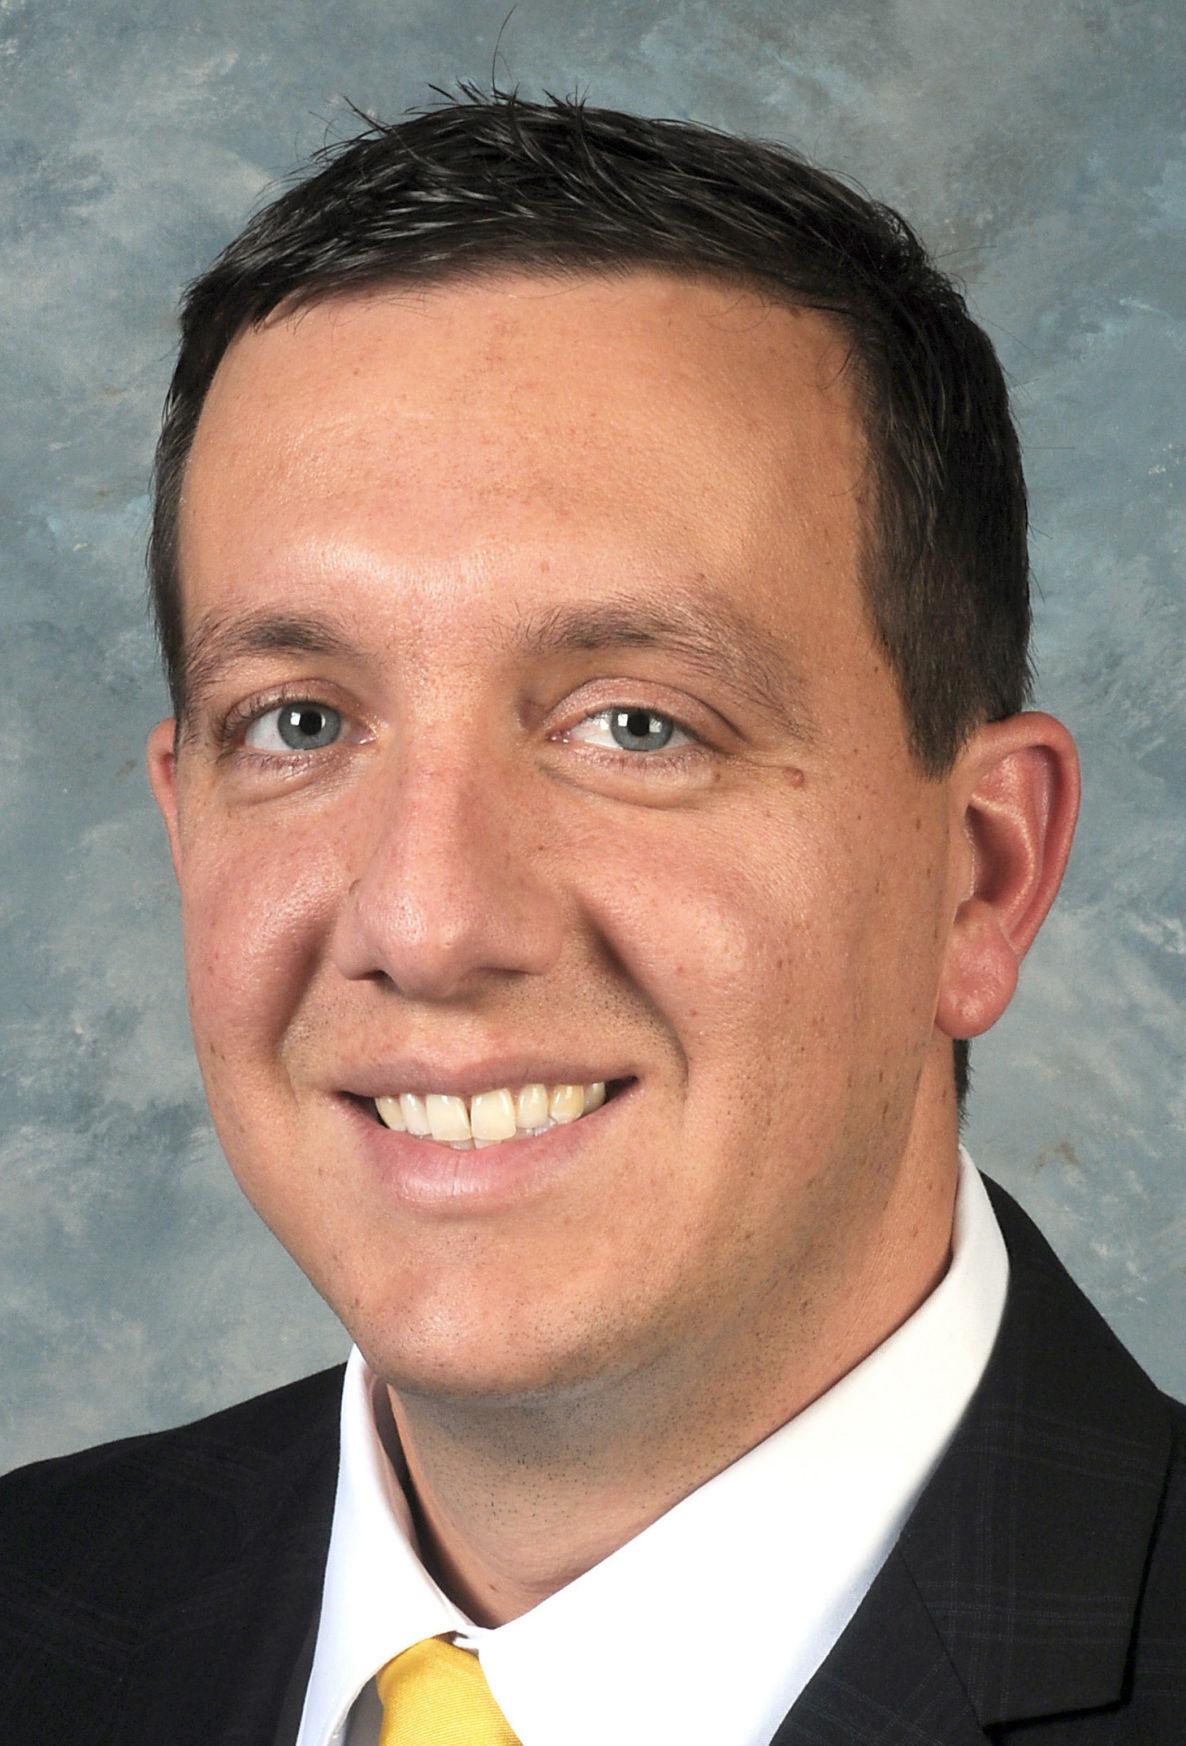 Sen. Matt Castlen recognized as a 2021 Partner for Commonsense Justice